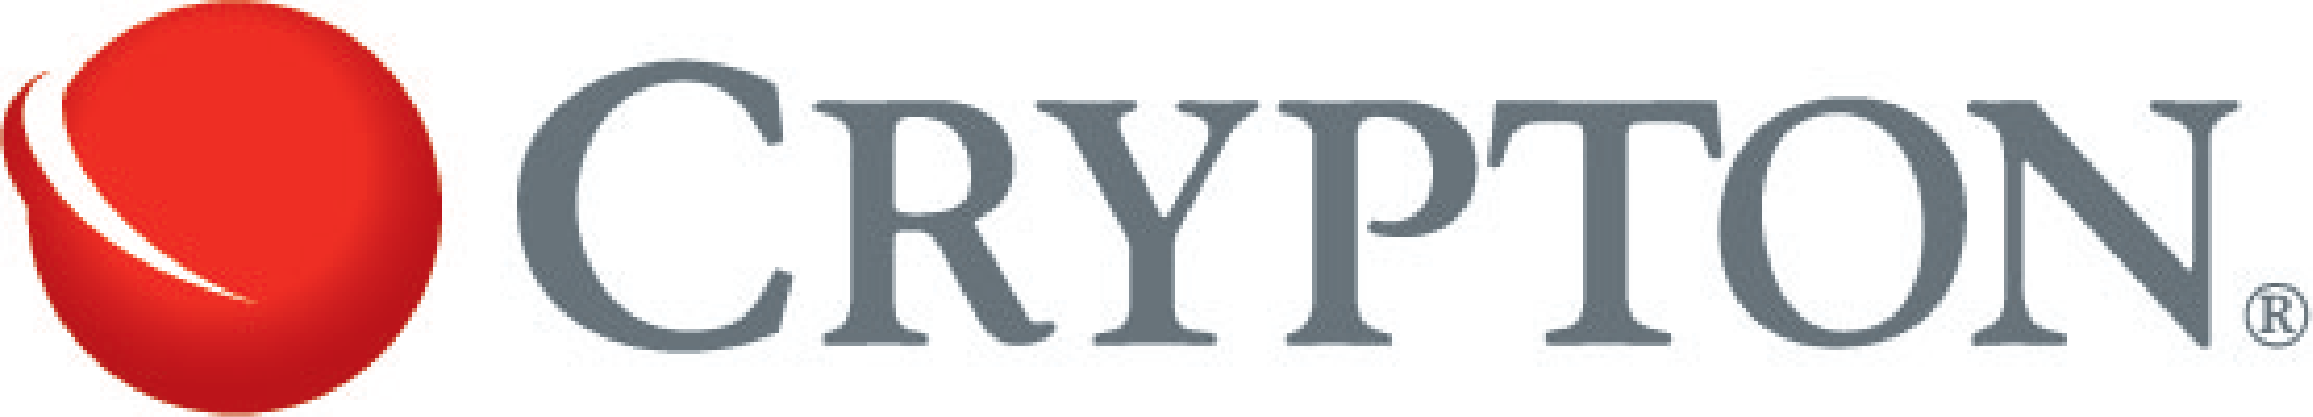 Crypton_CORP_4C_logo.png